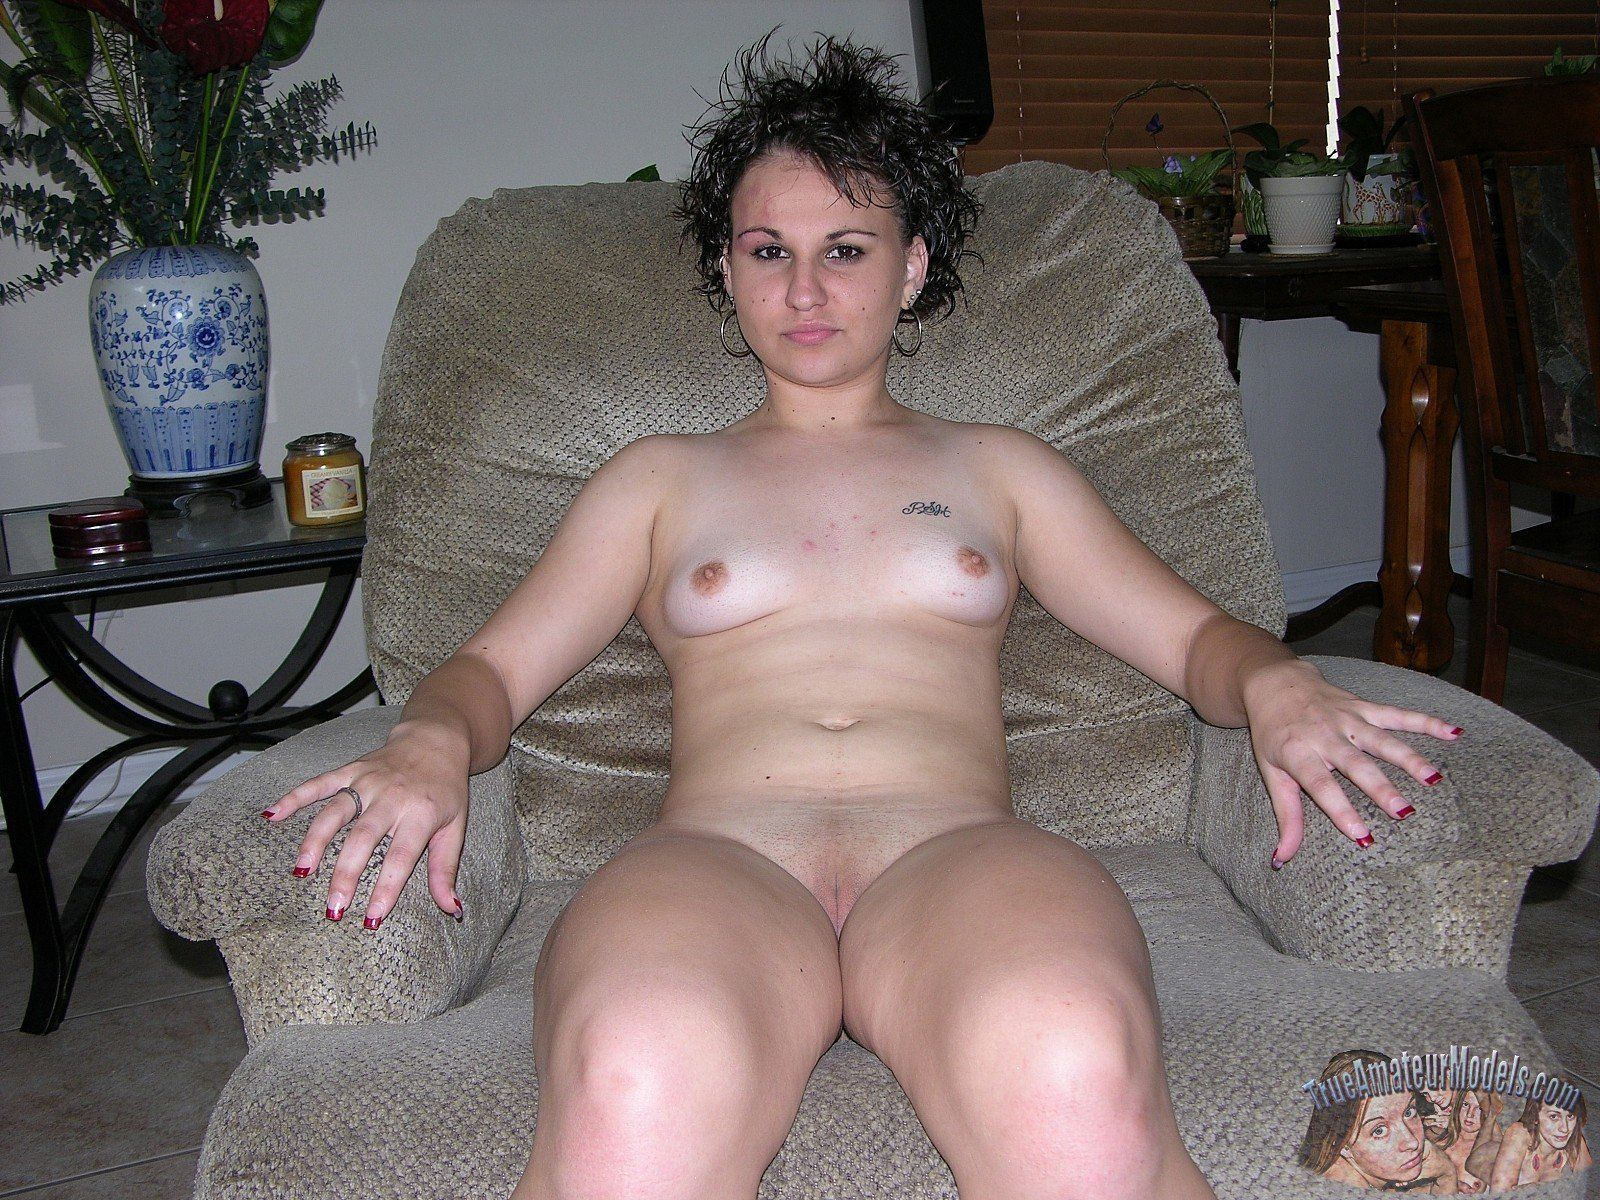 Interstate reccomend Short hair amateur nudes